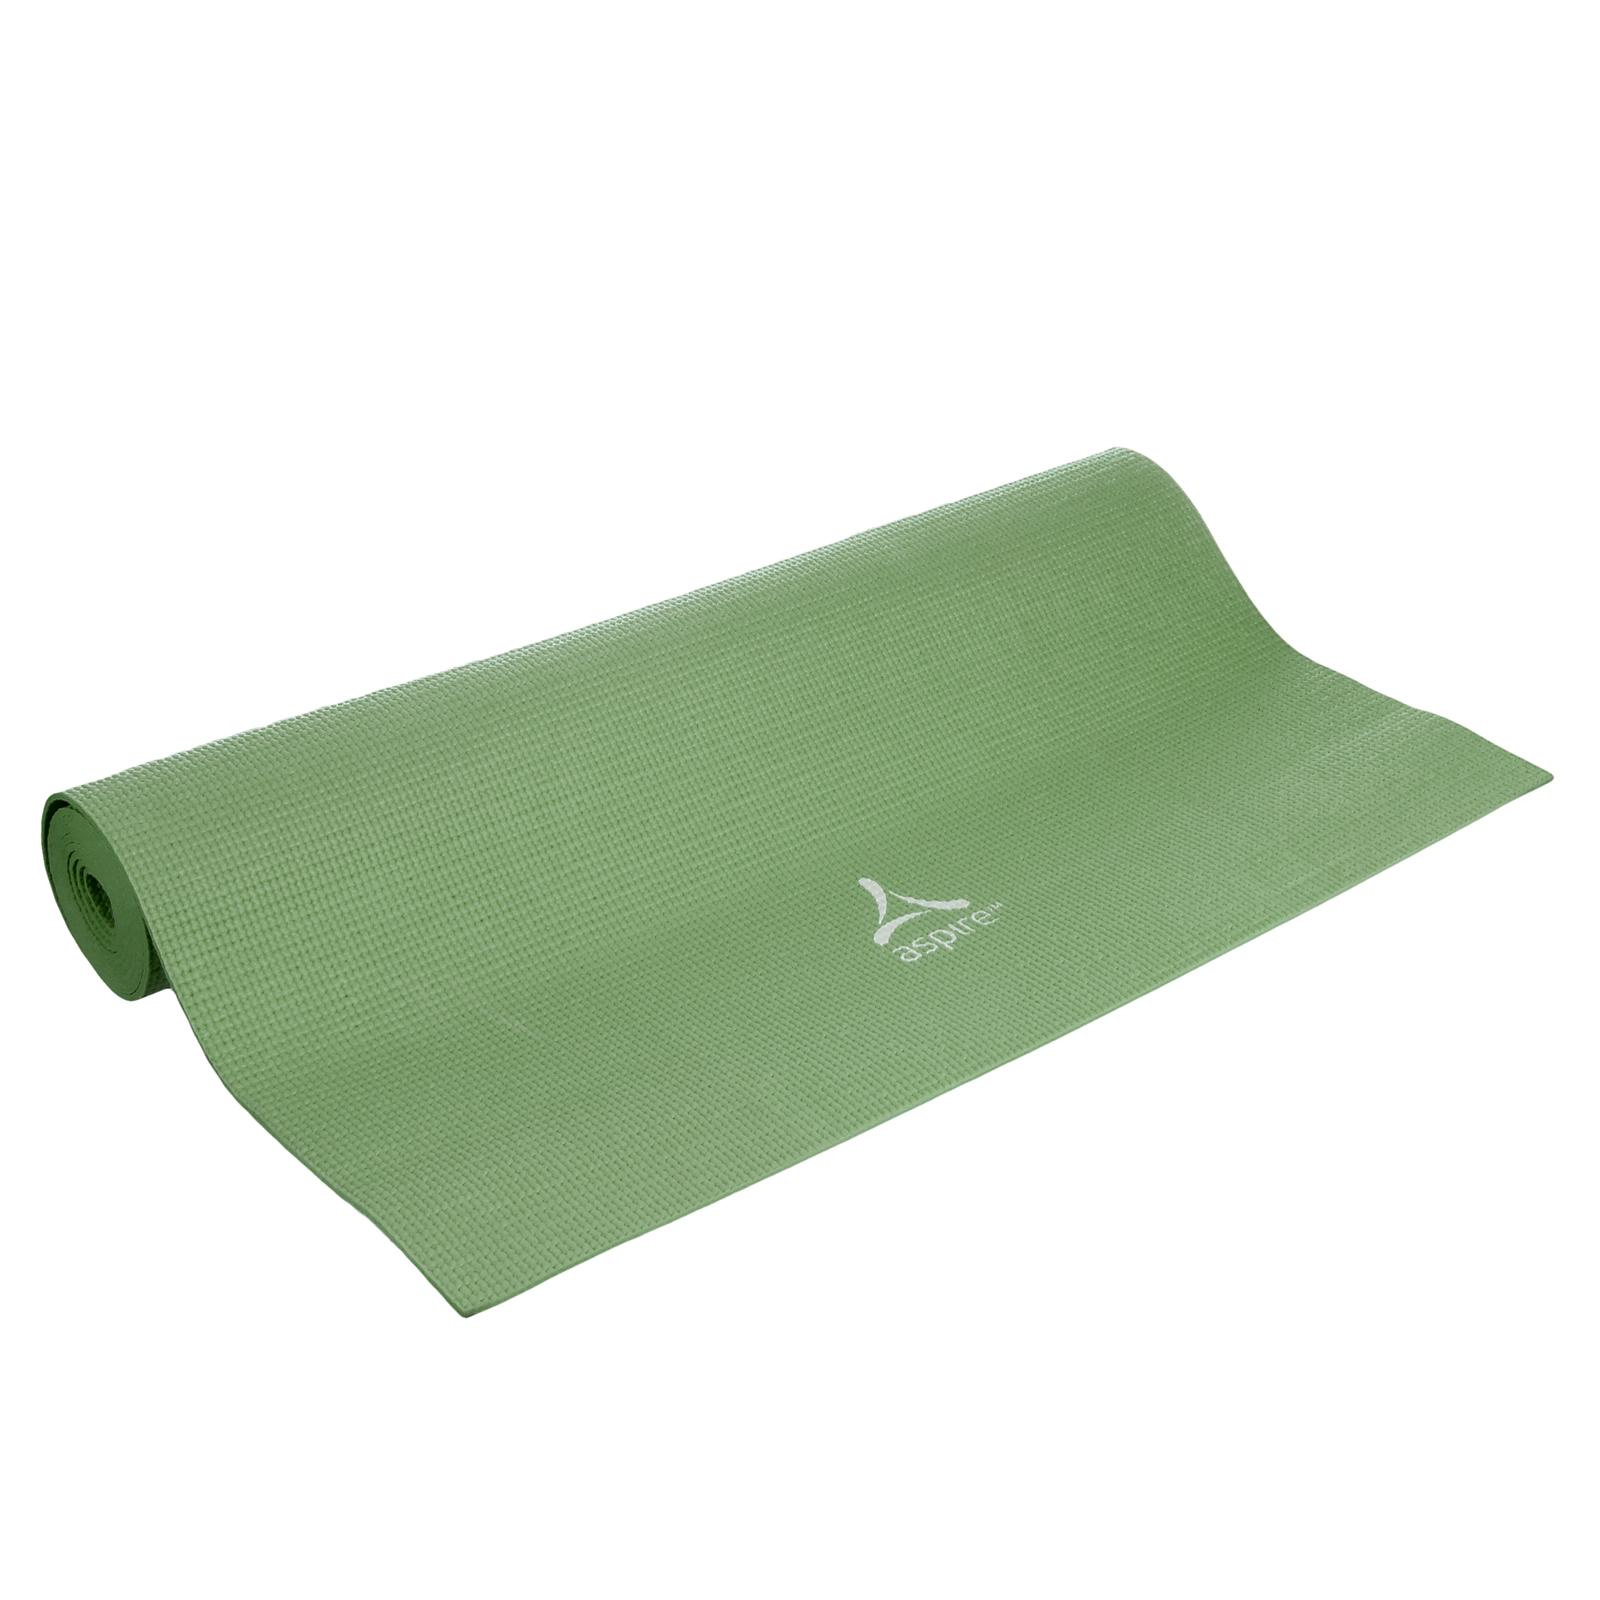 Gaiam 3mm Phthalate Free Nonslip Exercise Pilates Yoga